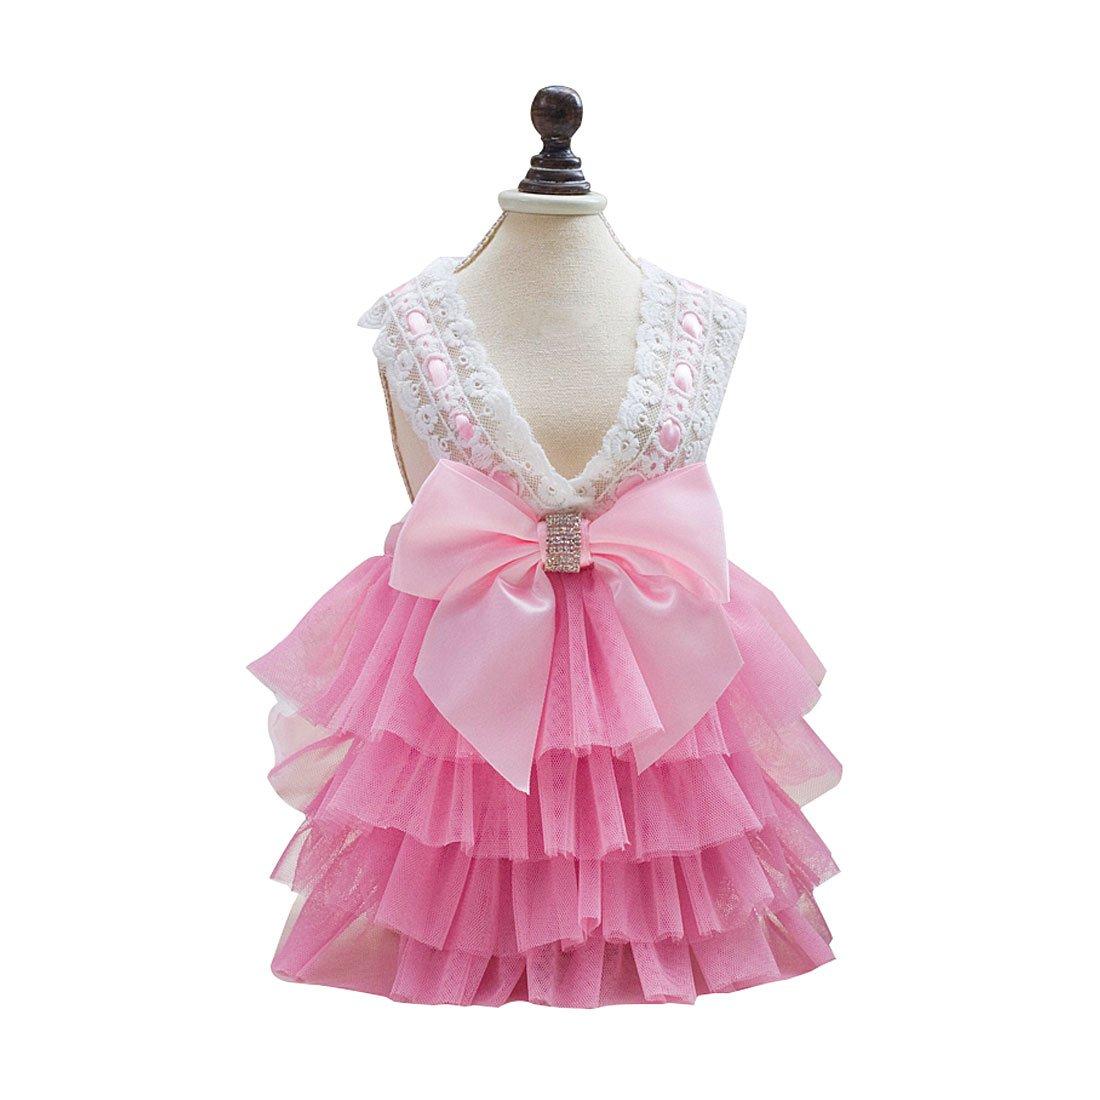 sourcingmap Falda de moda Princesa para cachorro de Perro MascotaTutu vestido de verano a17042000ux0528